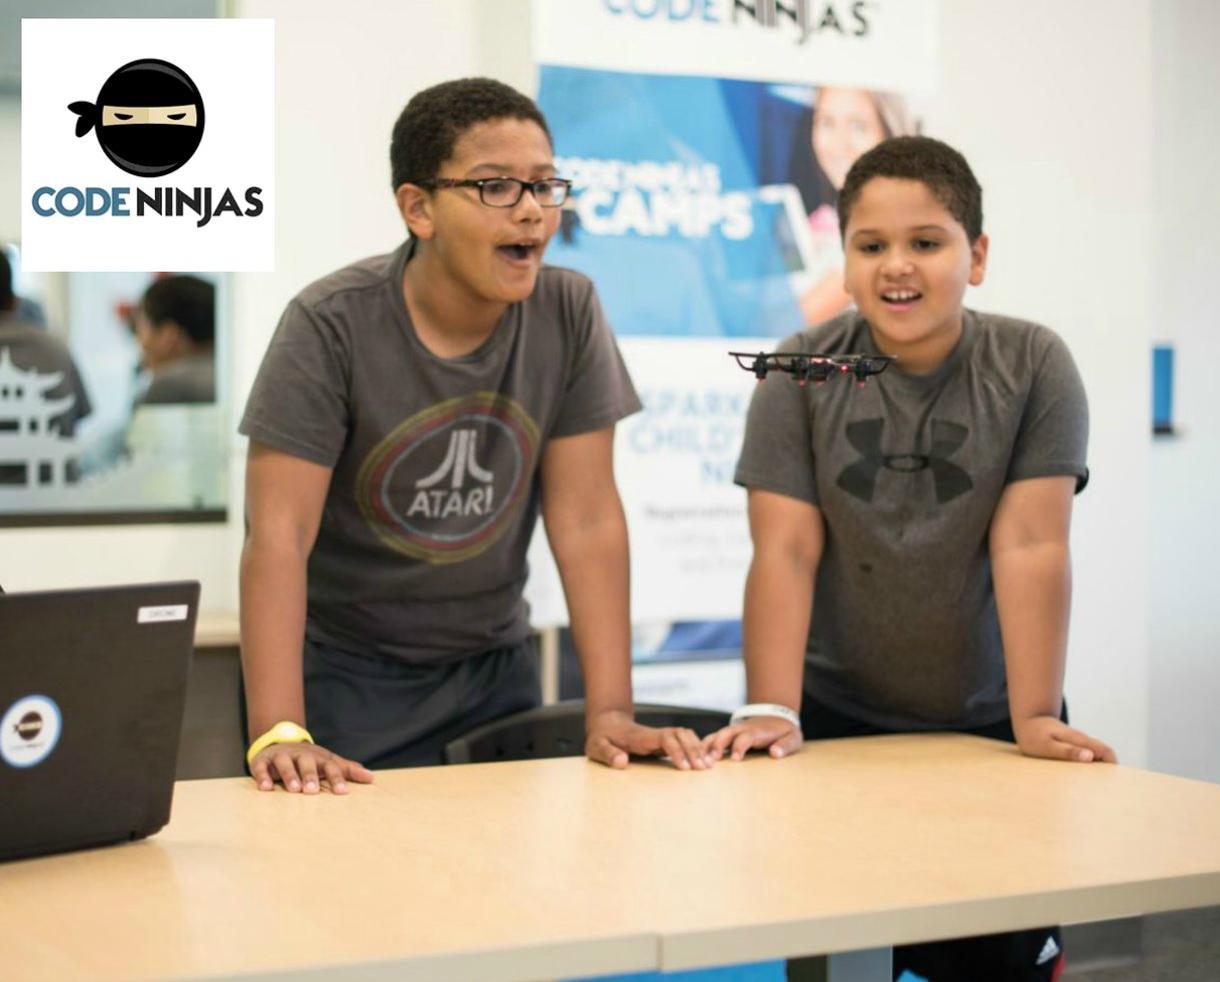 Drop-In Classes at NEW! Code Ninjas - Minecraft, Drones, Roblox & More